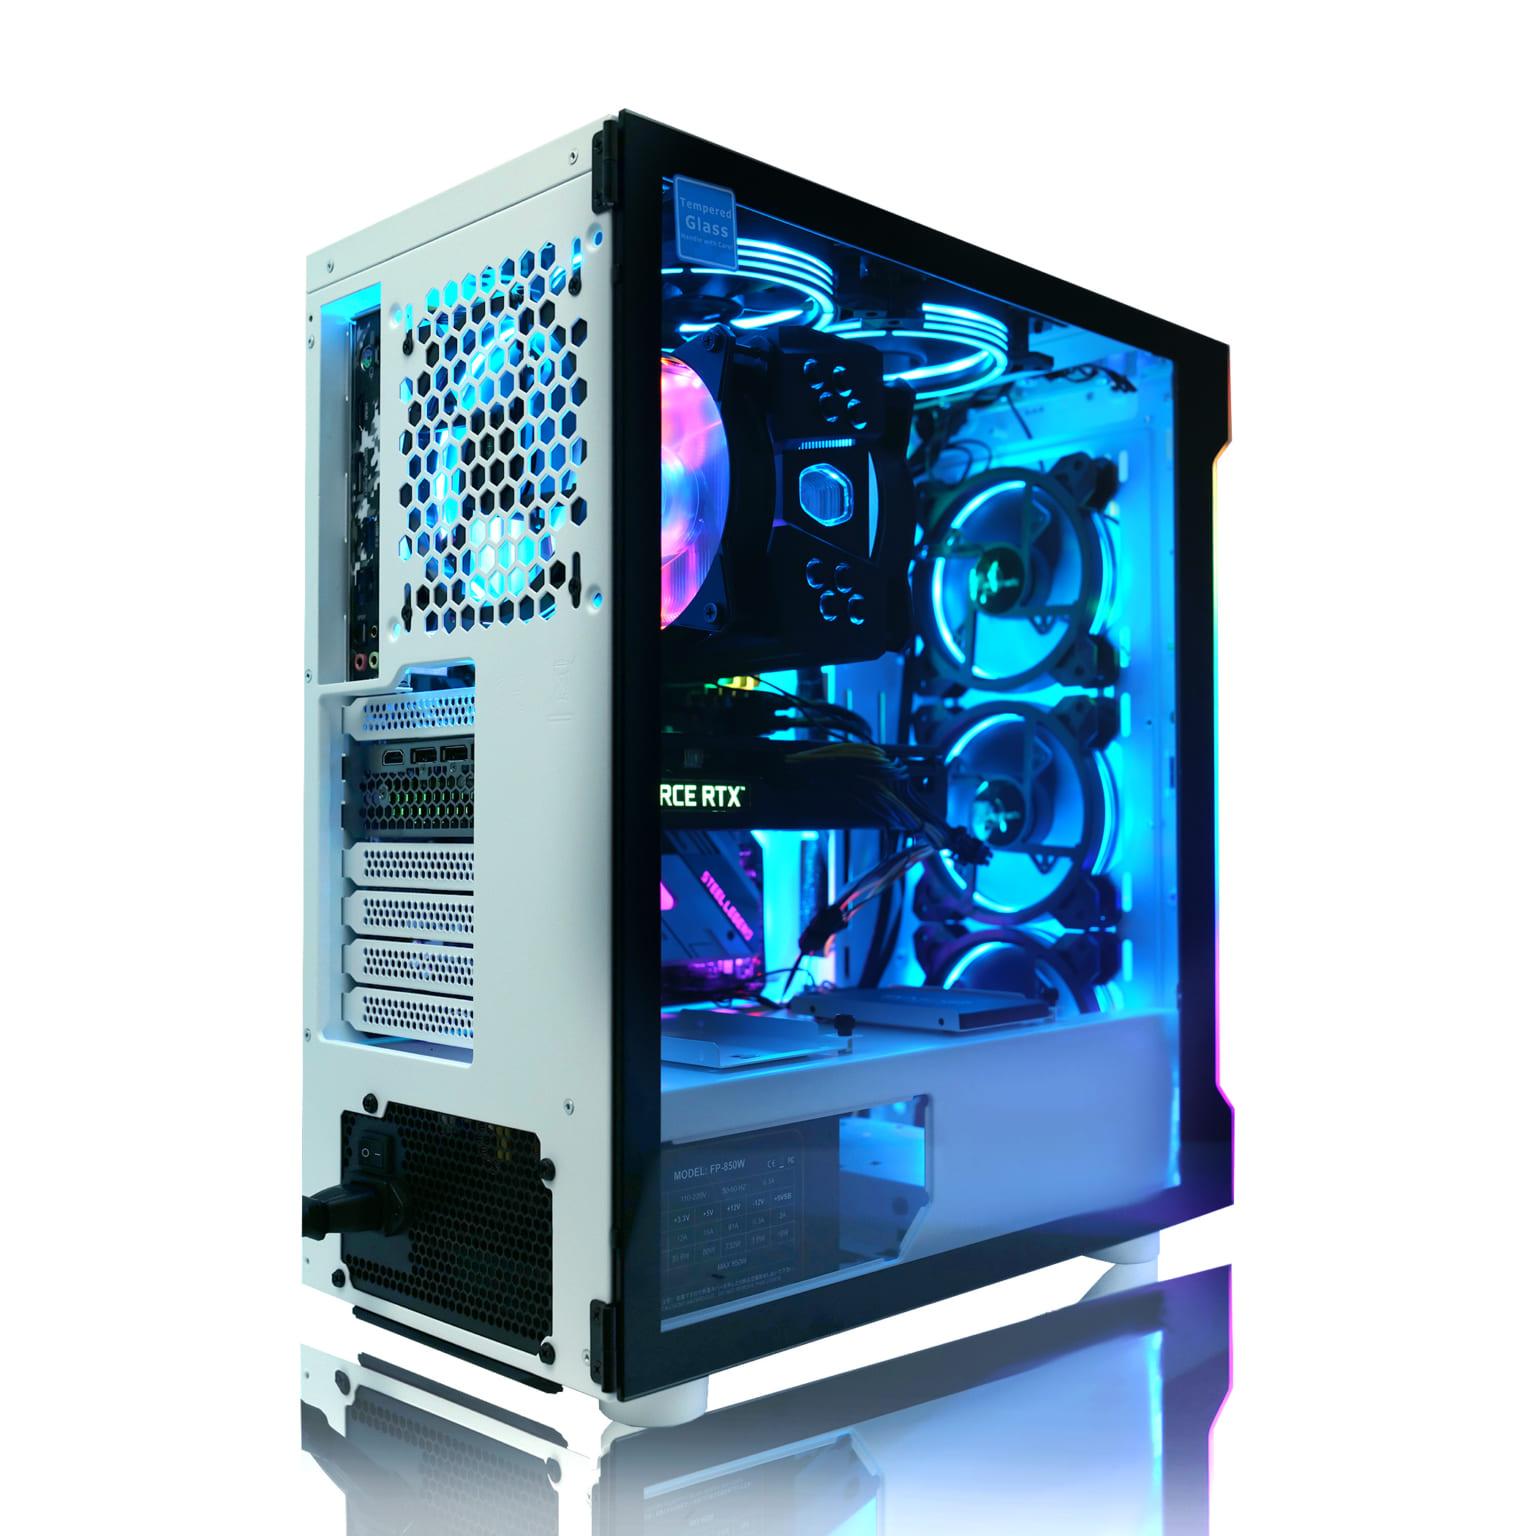 【Astromeda ORION】Corei7-10700KF | GeForce RTX 3060 12GB | White